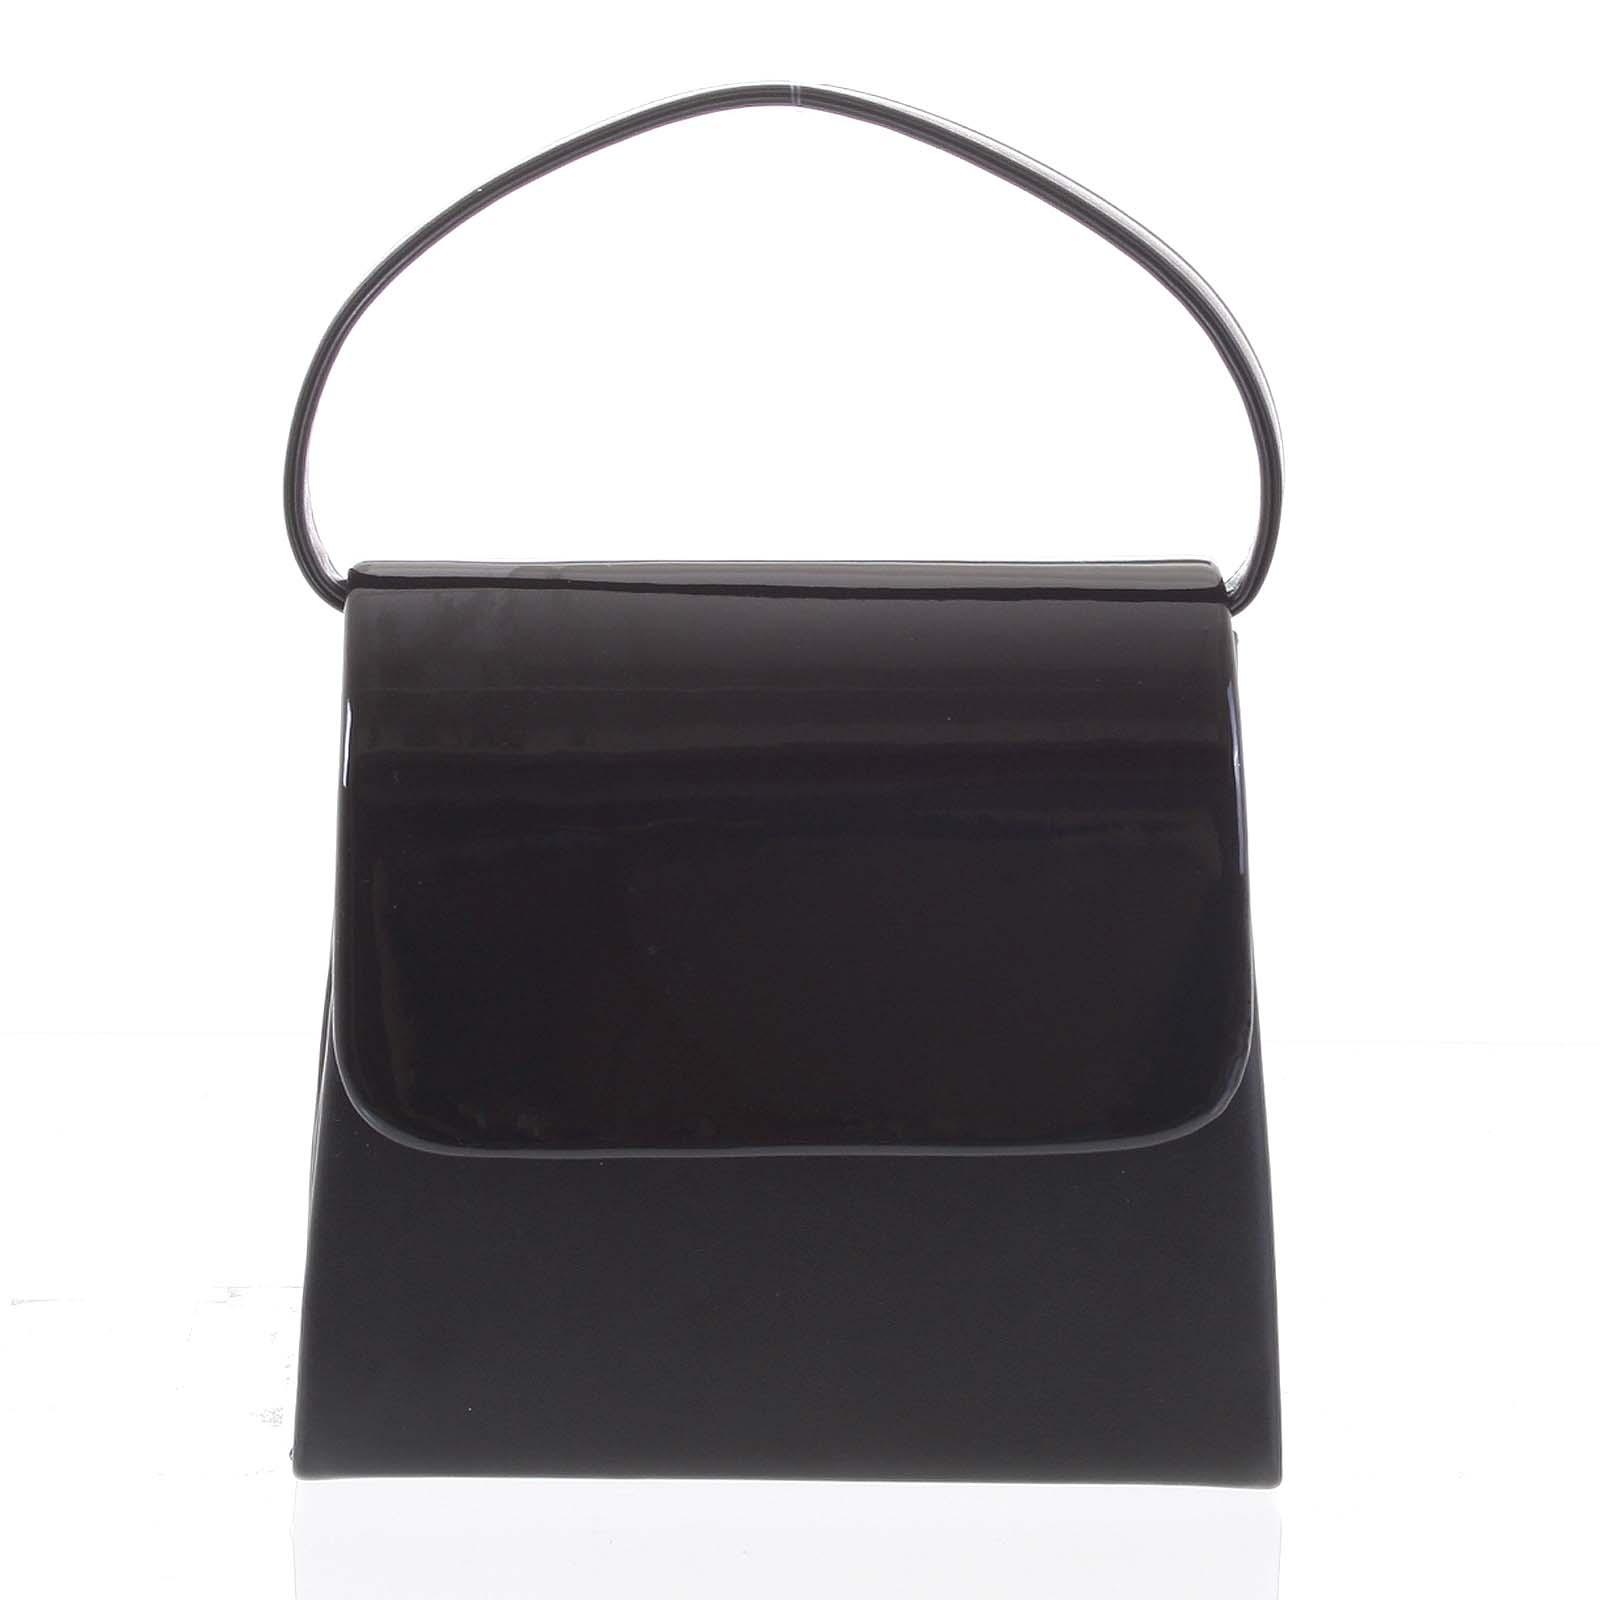 Luxusná dámska listová kabelka/kabelka čierna - Delami Viseria